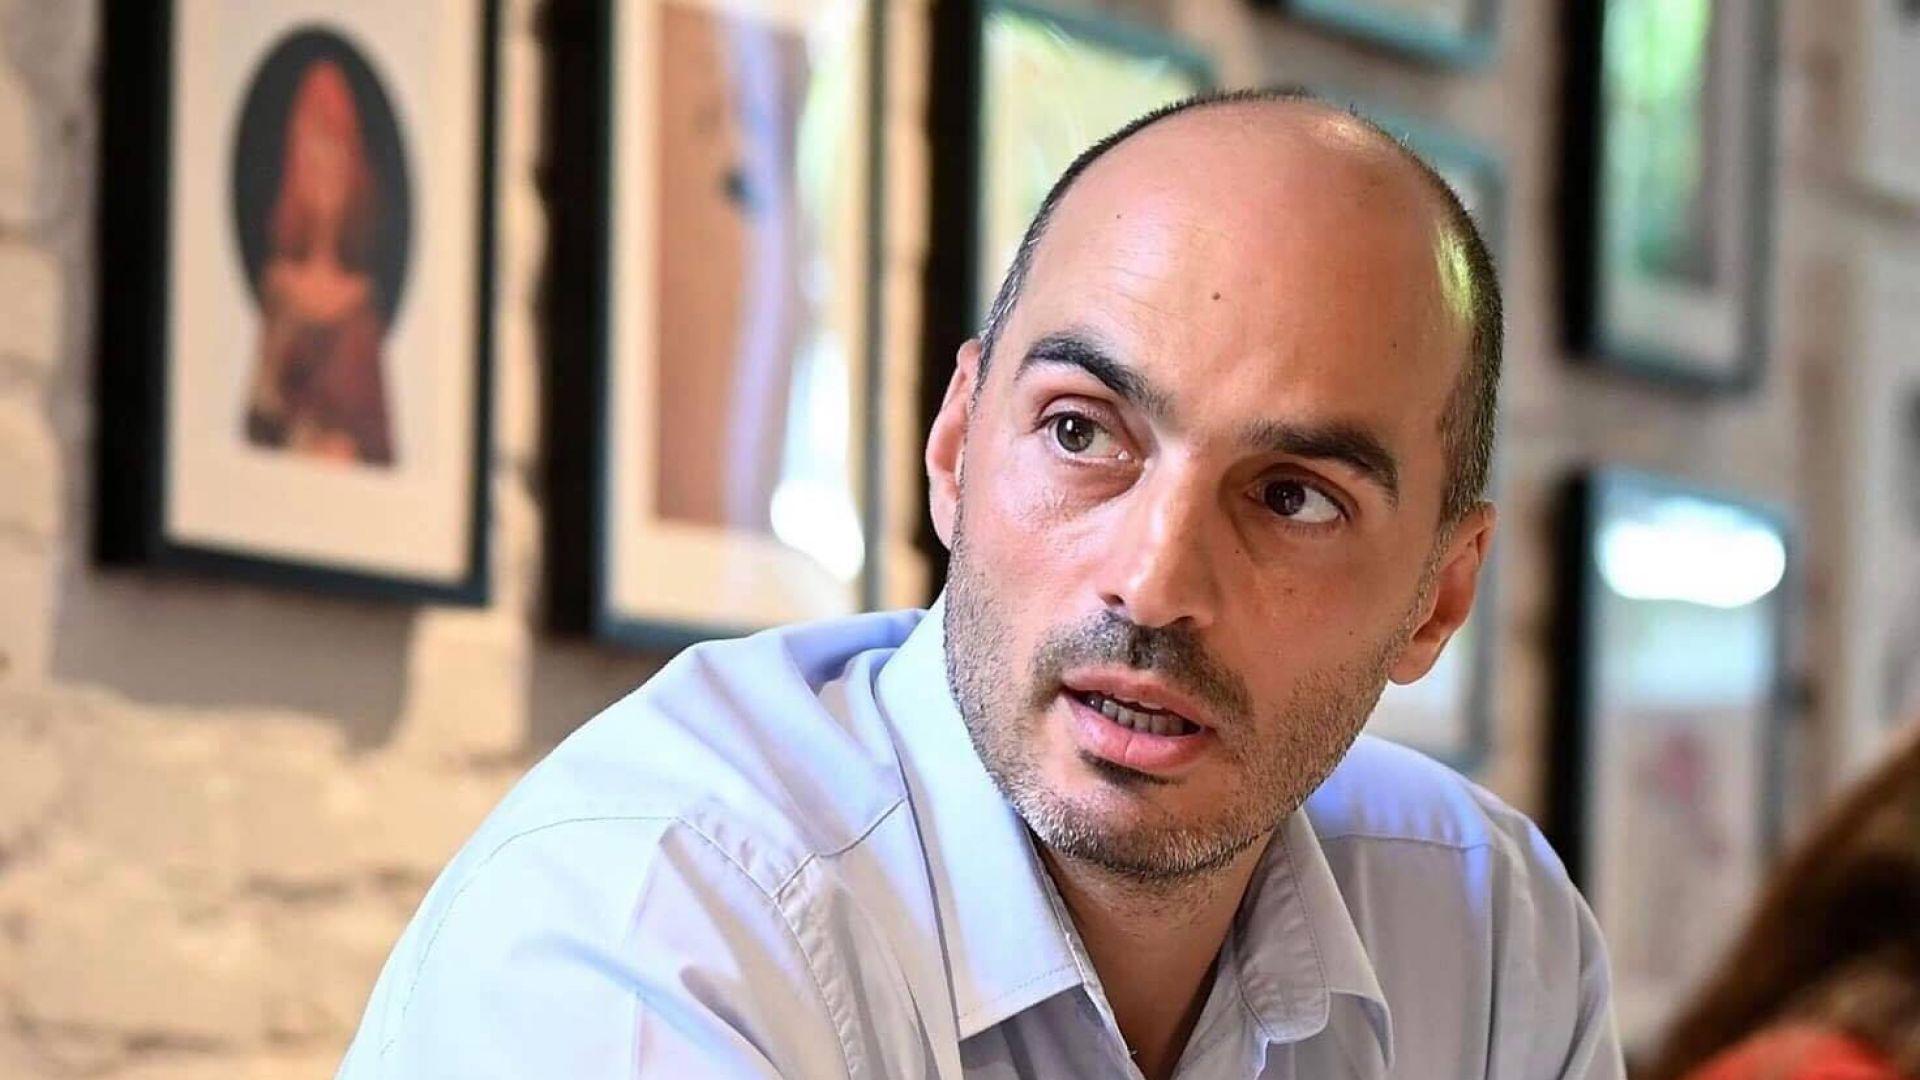 Арх. Борислав Игнатов предлага прозрачно бюджетиране и гражданско участие в управлението на бюджета